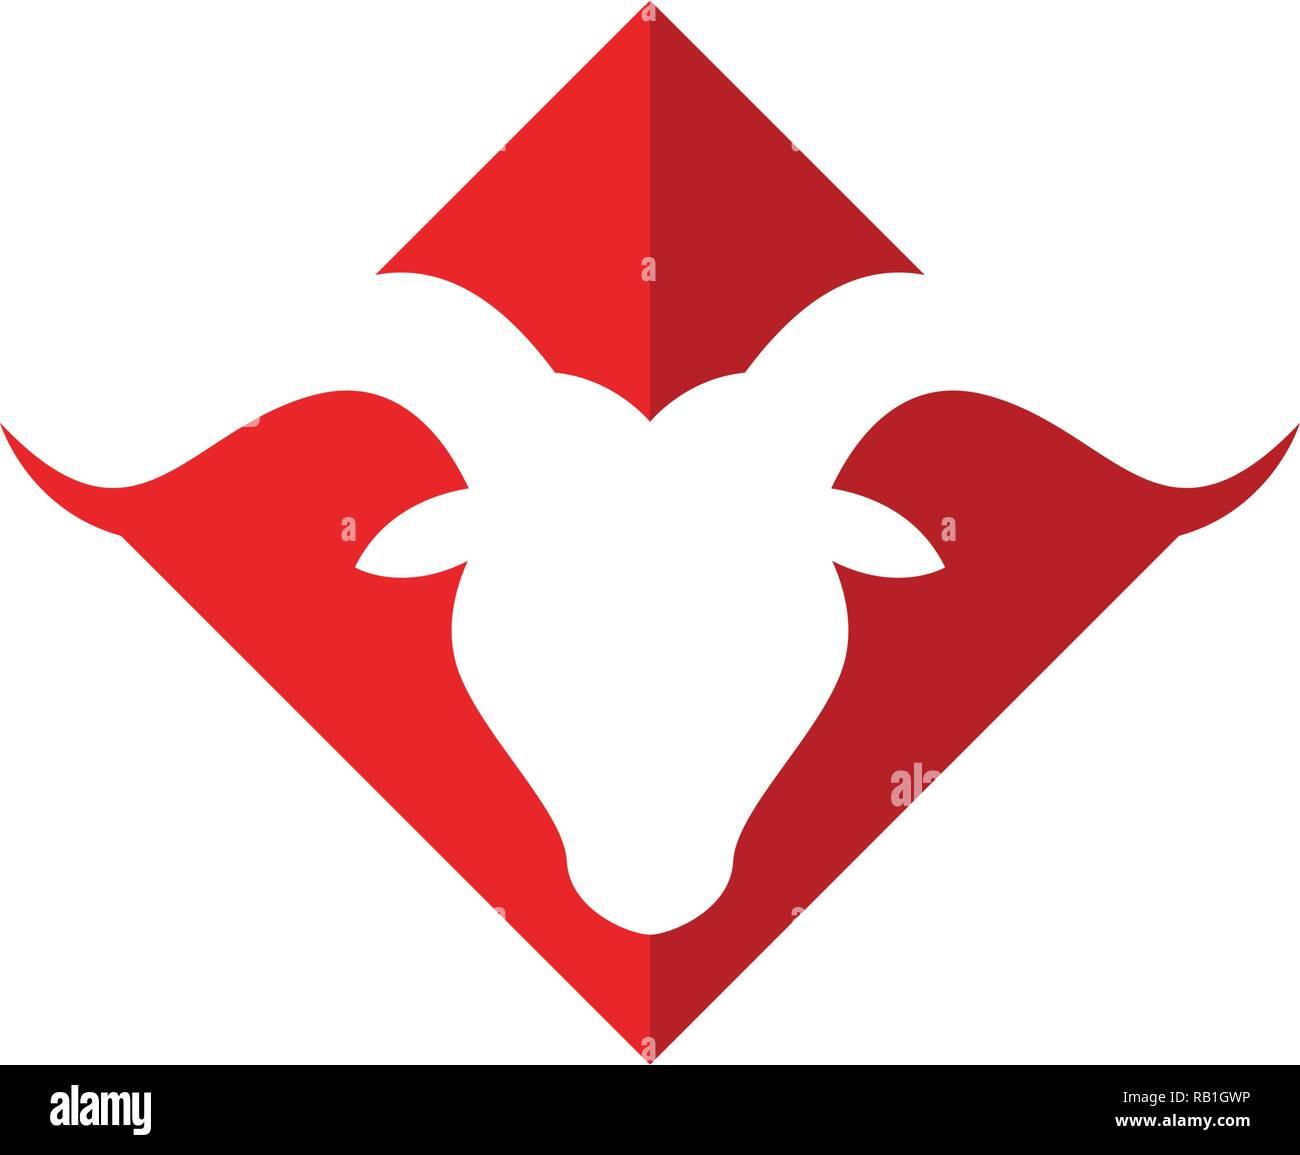 Bull horn logo symbols template icons app Stock Vector Art